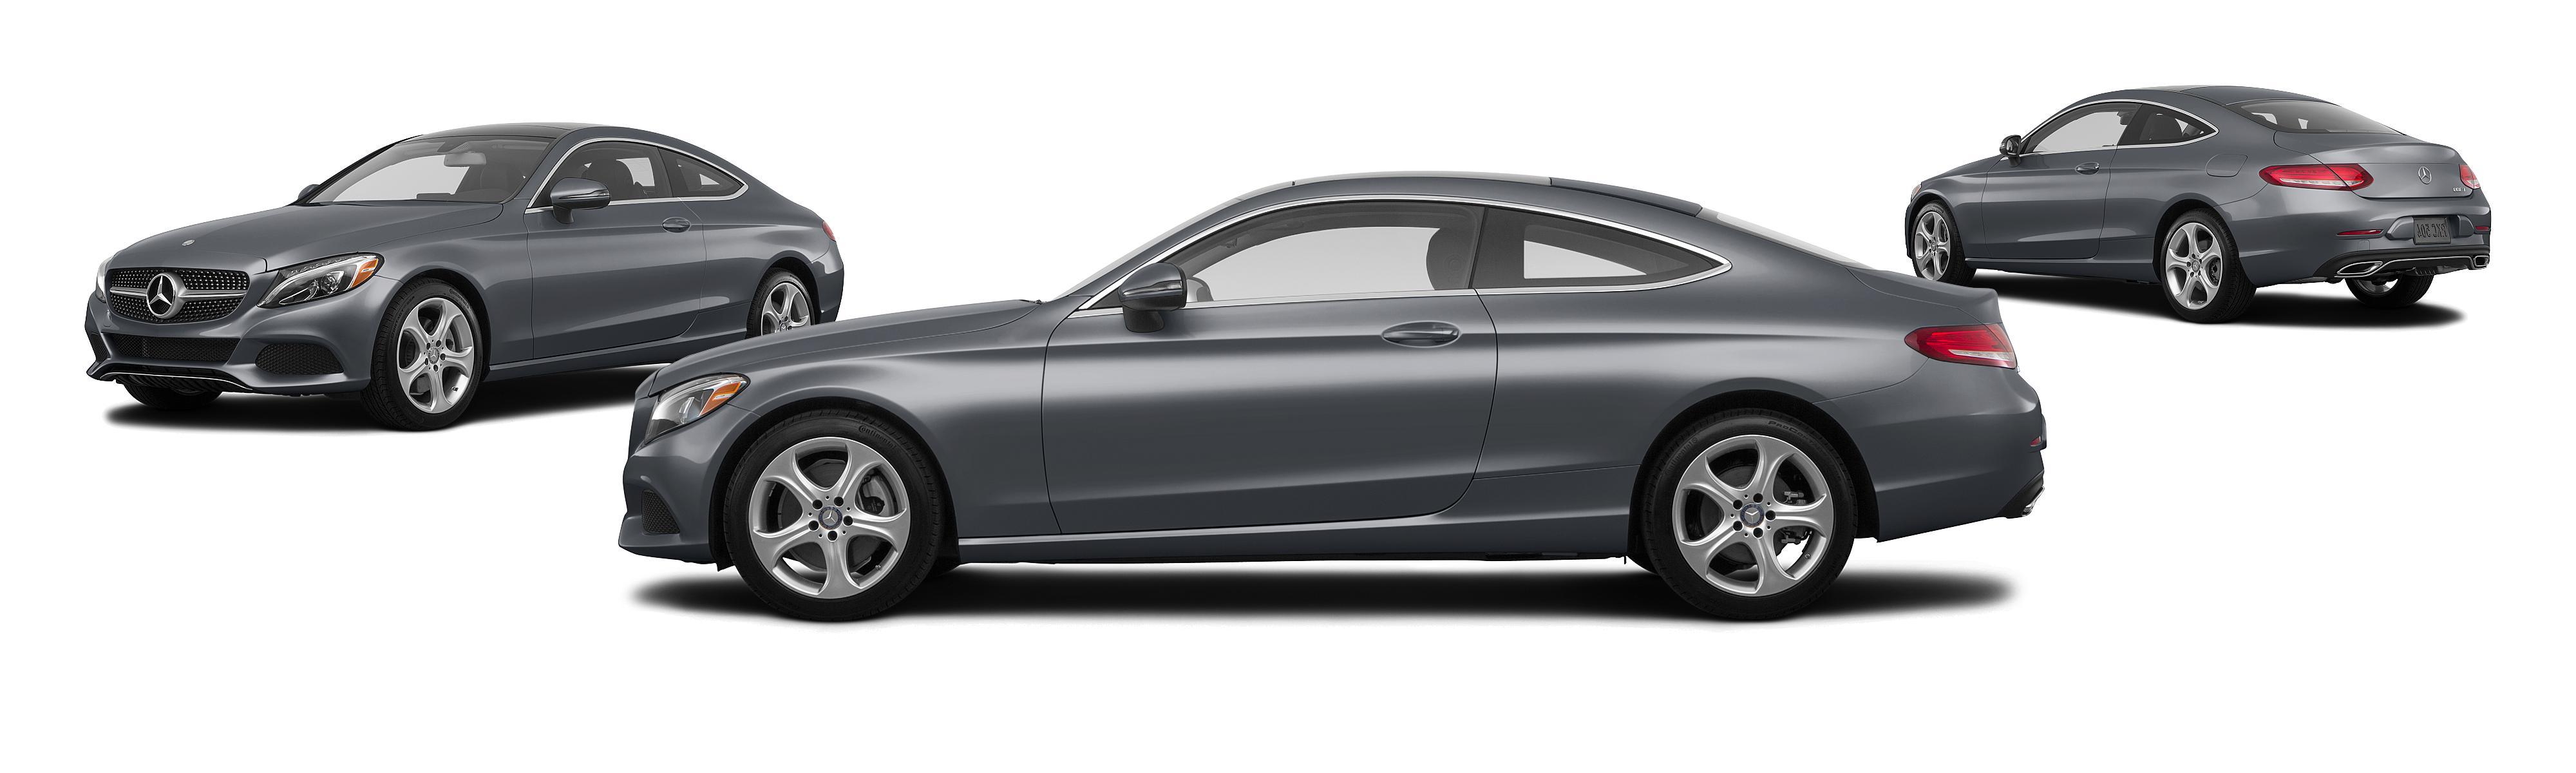 2017 mercedes benz c class c 300 2dr coupe selenite grey metallic posite large